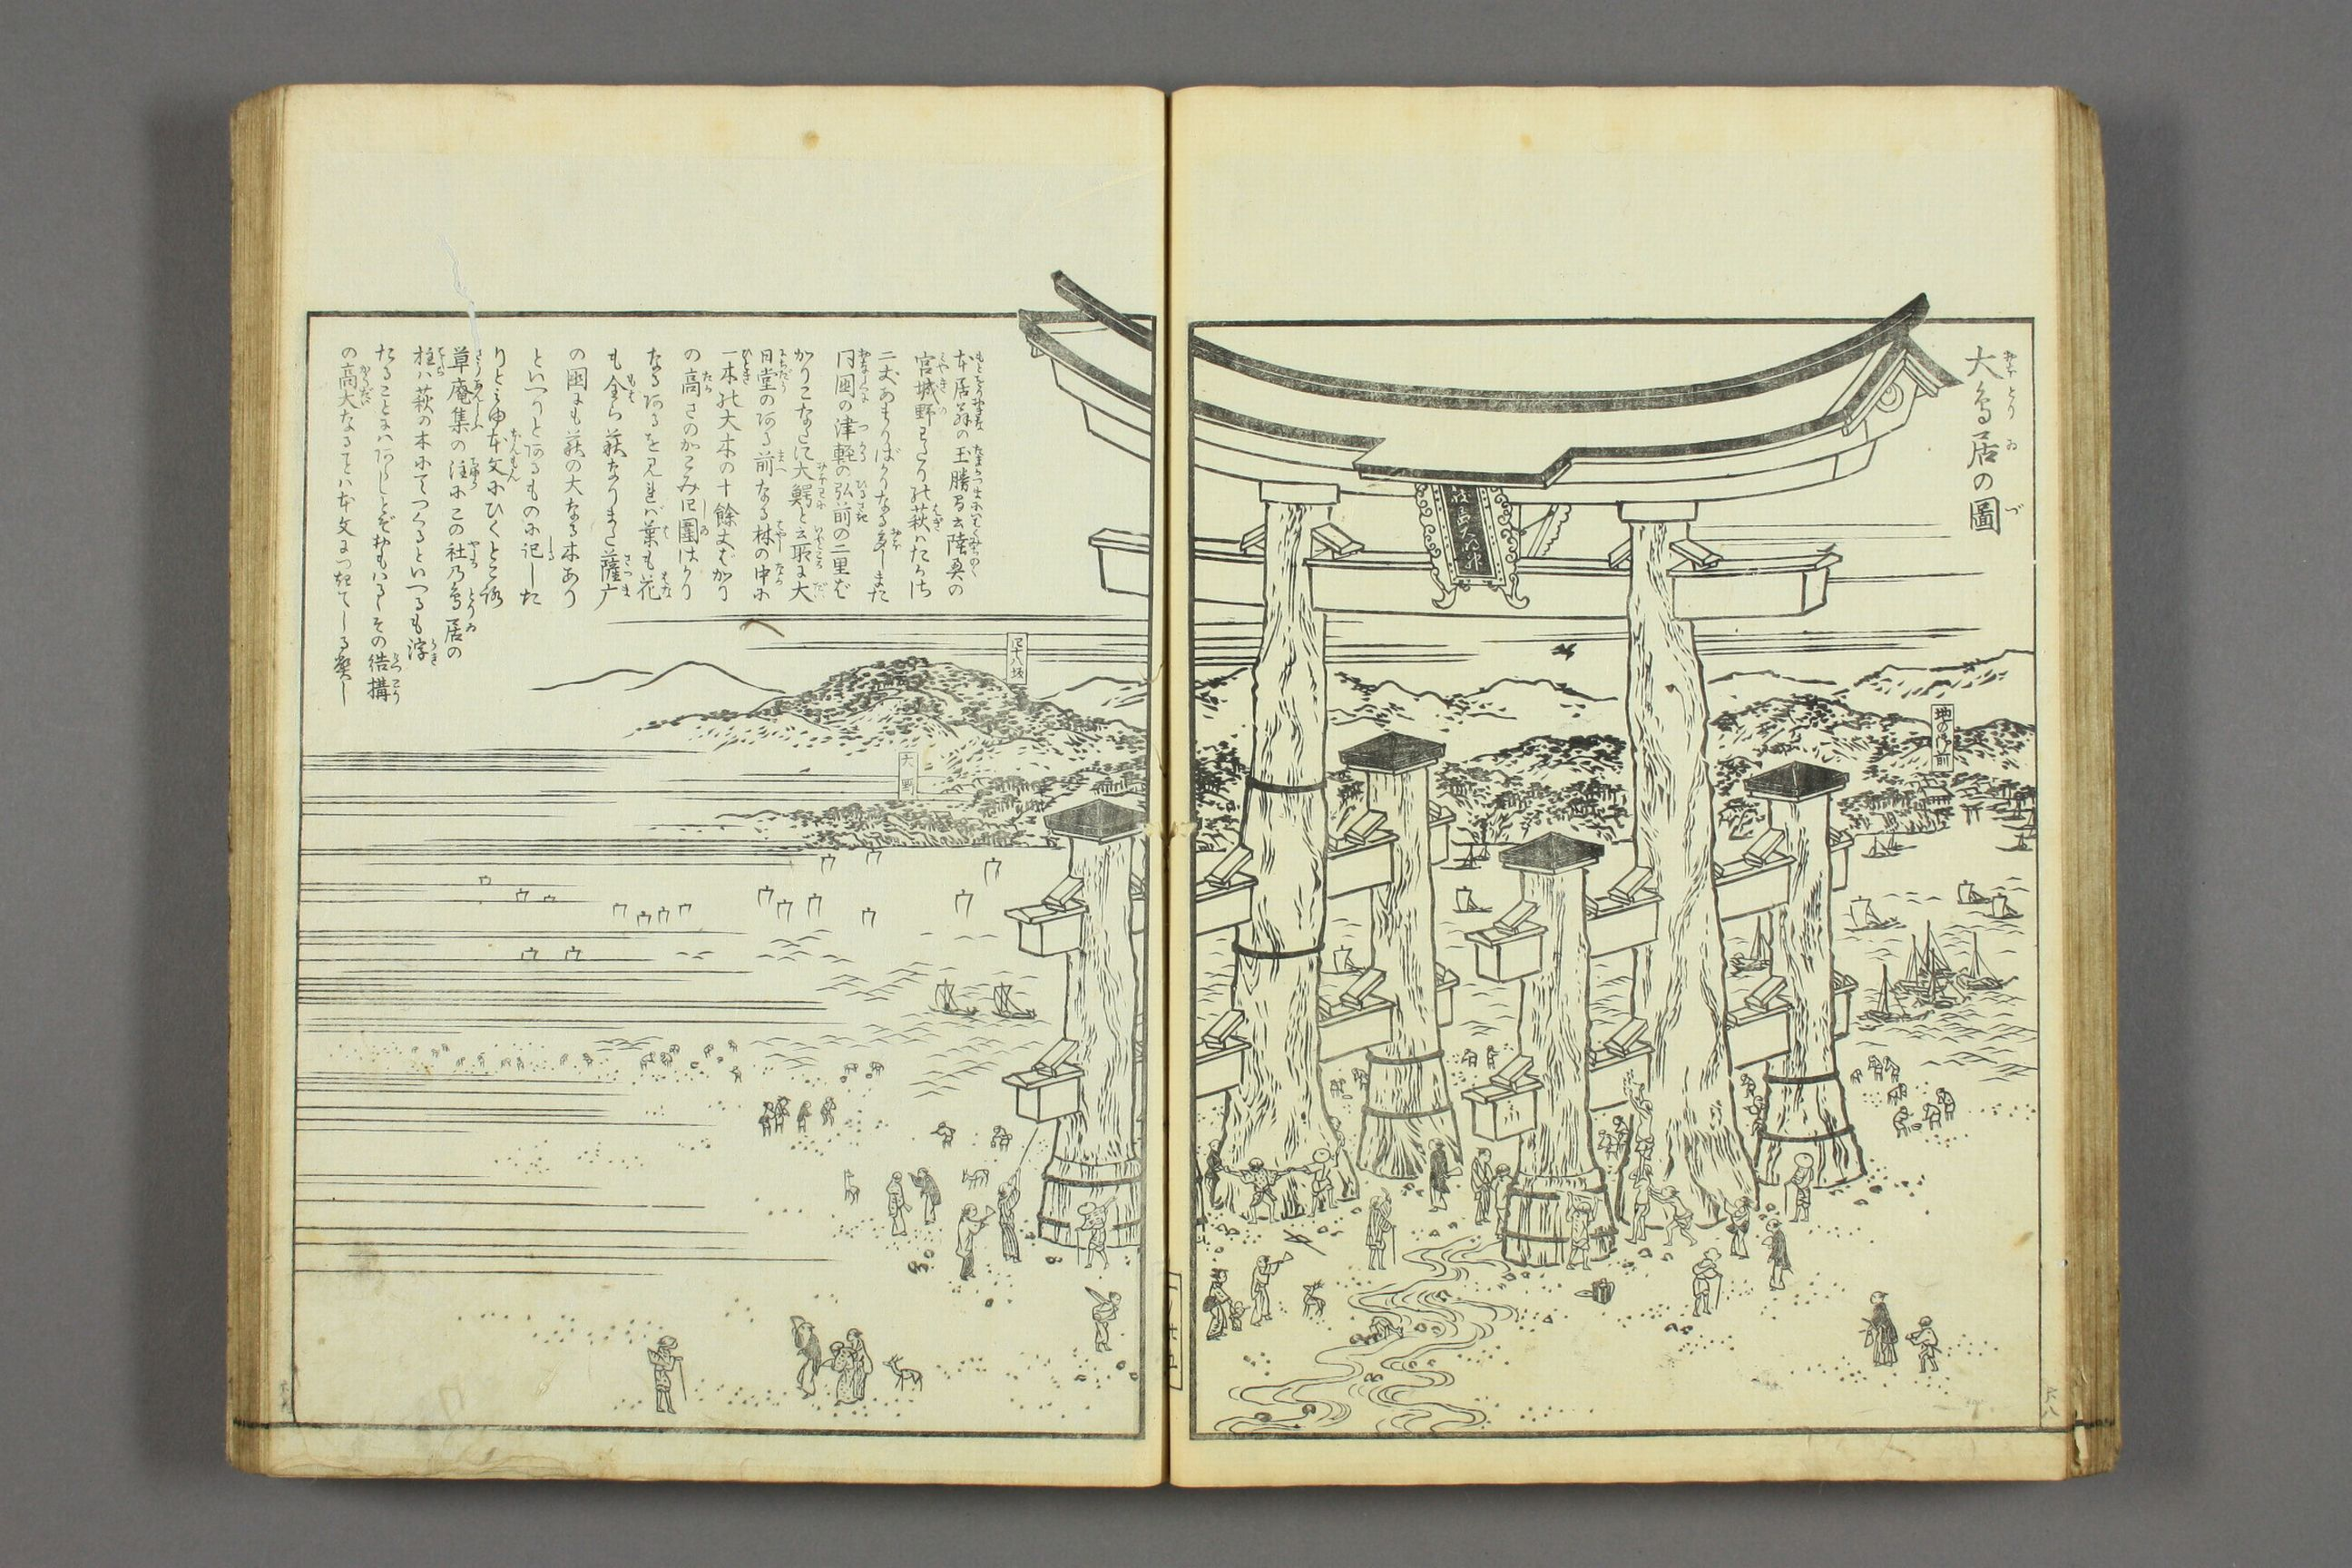 http://archive.wul.waseda.ac.jp/kosho/bunko30/bunko30_e0225/bunko30_e0225_0001/bunko30_e0225_0001_p0036.jpg